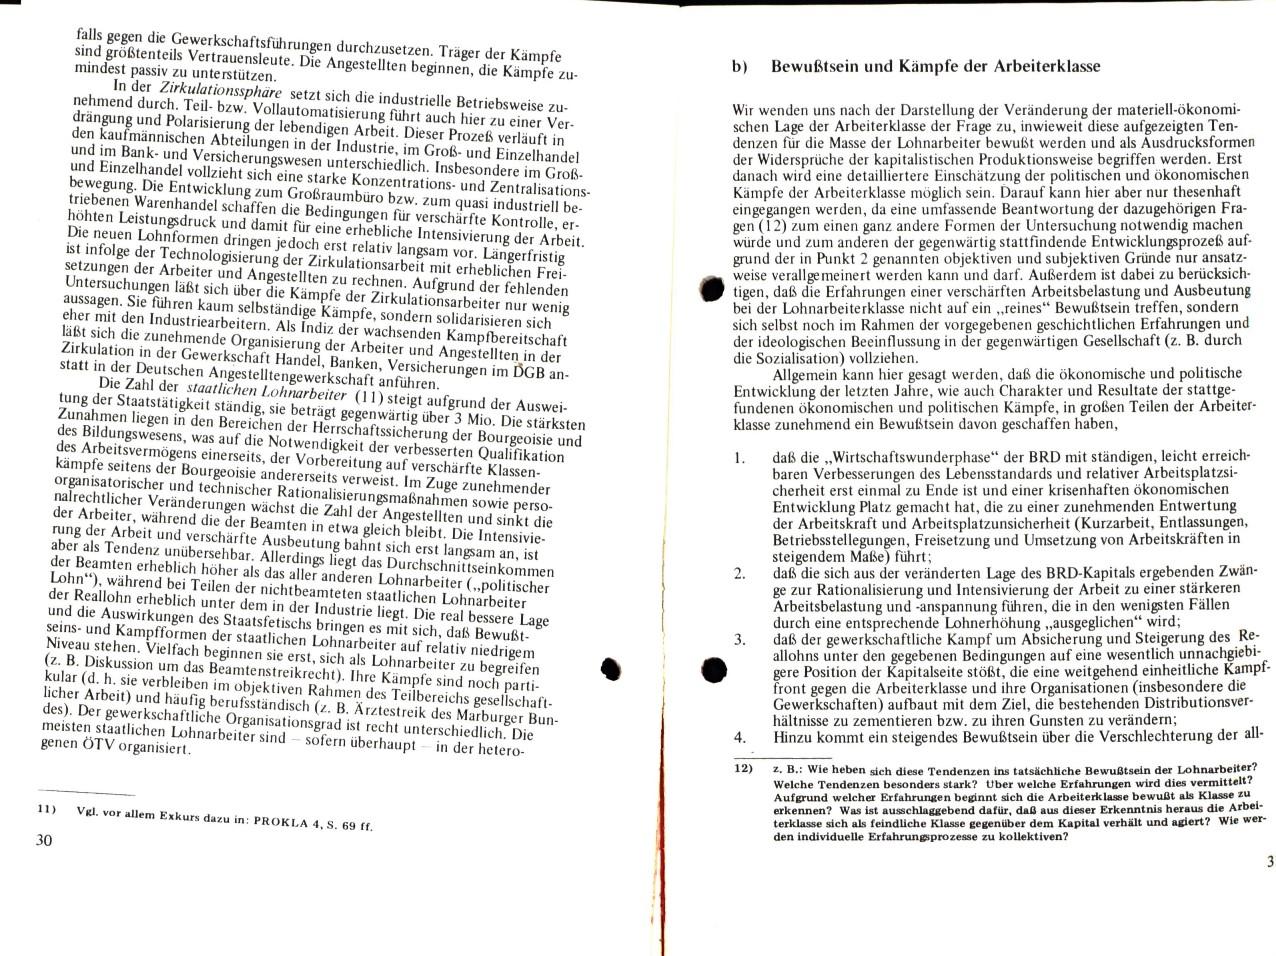 Berlin_KBML_Kommunist_1973_04s_17